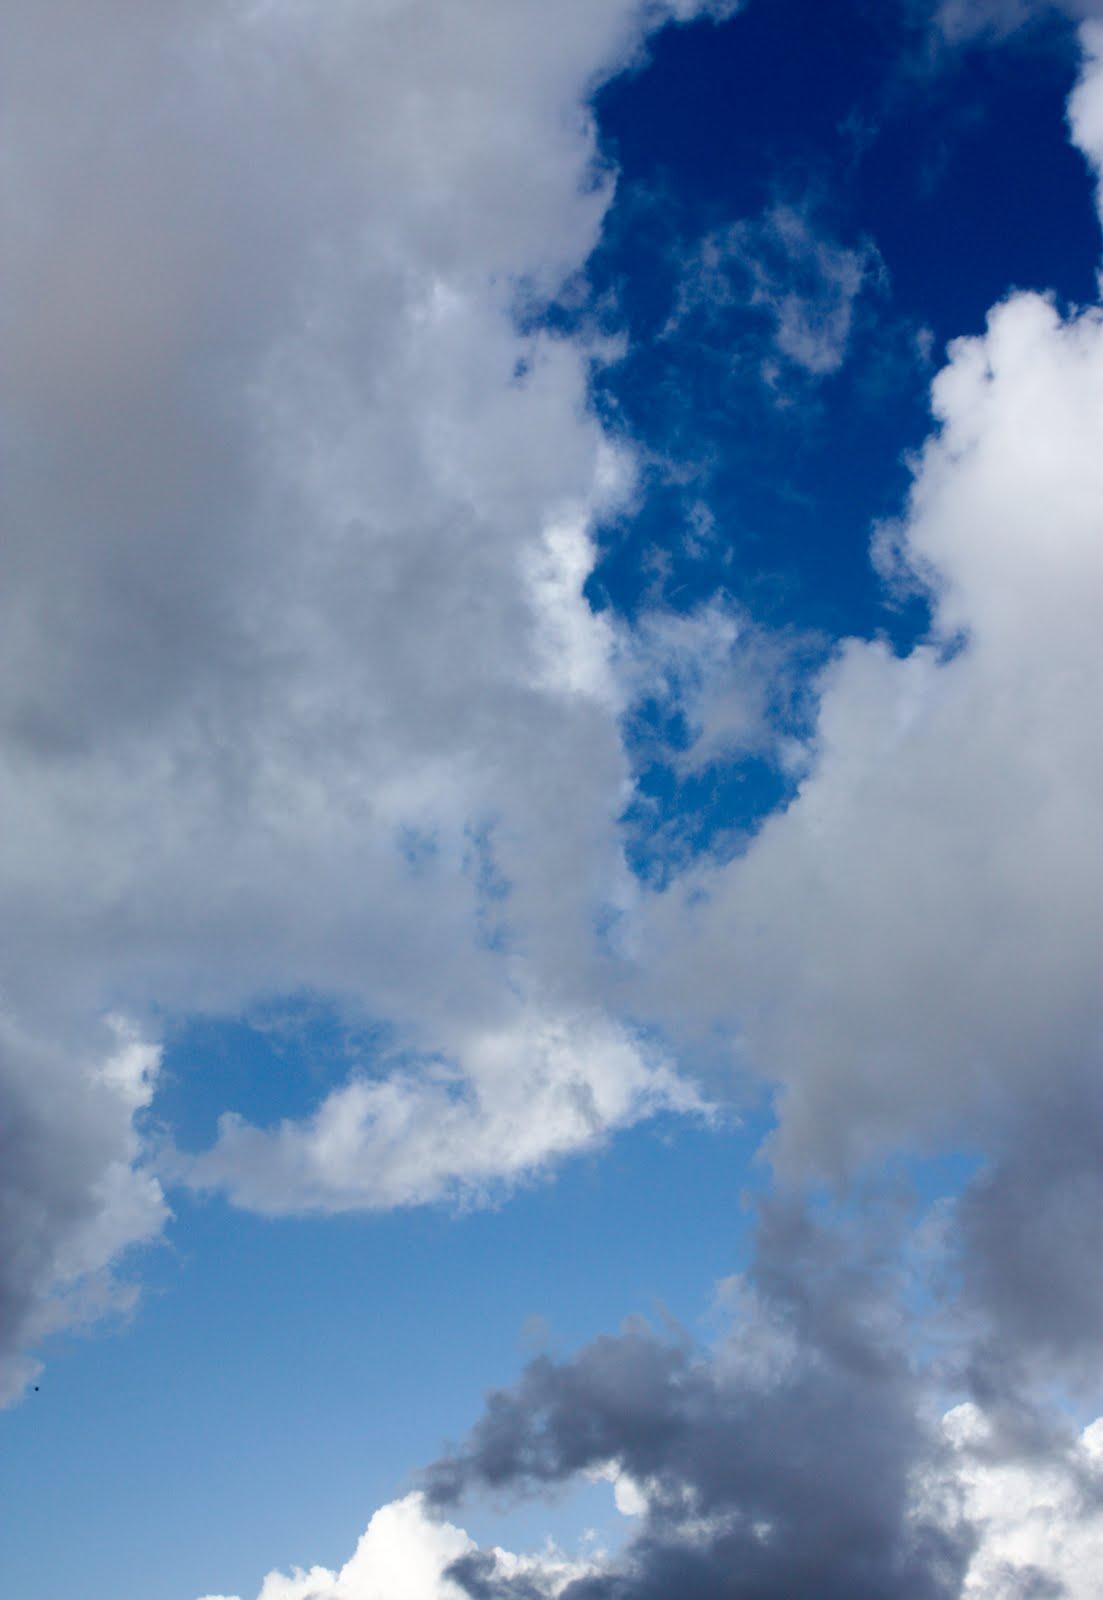 [fallbrook+storm+sky.jpg]